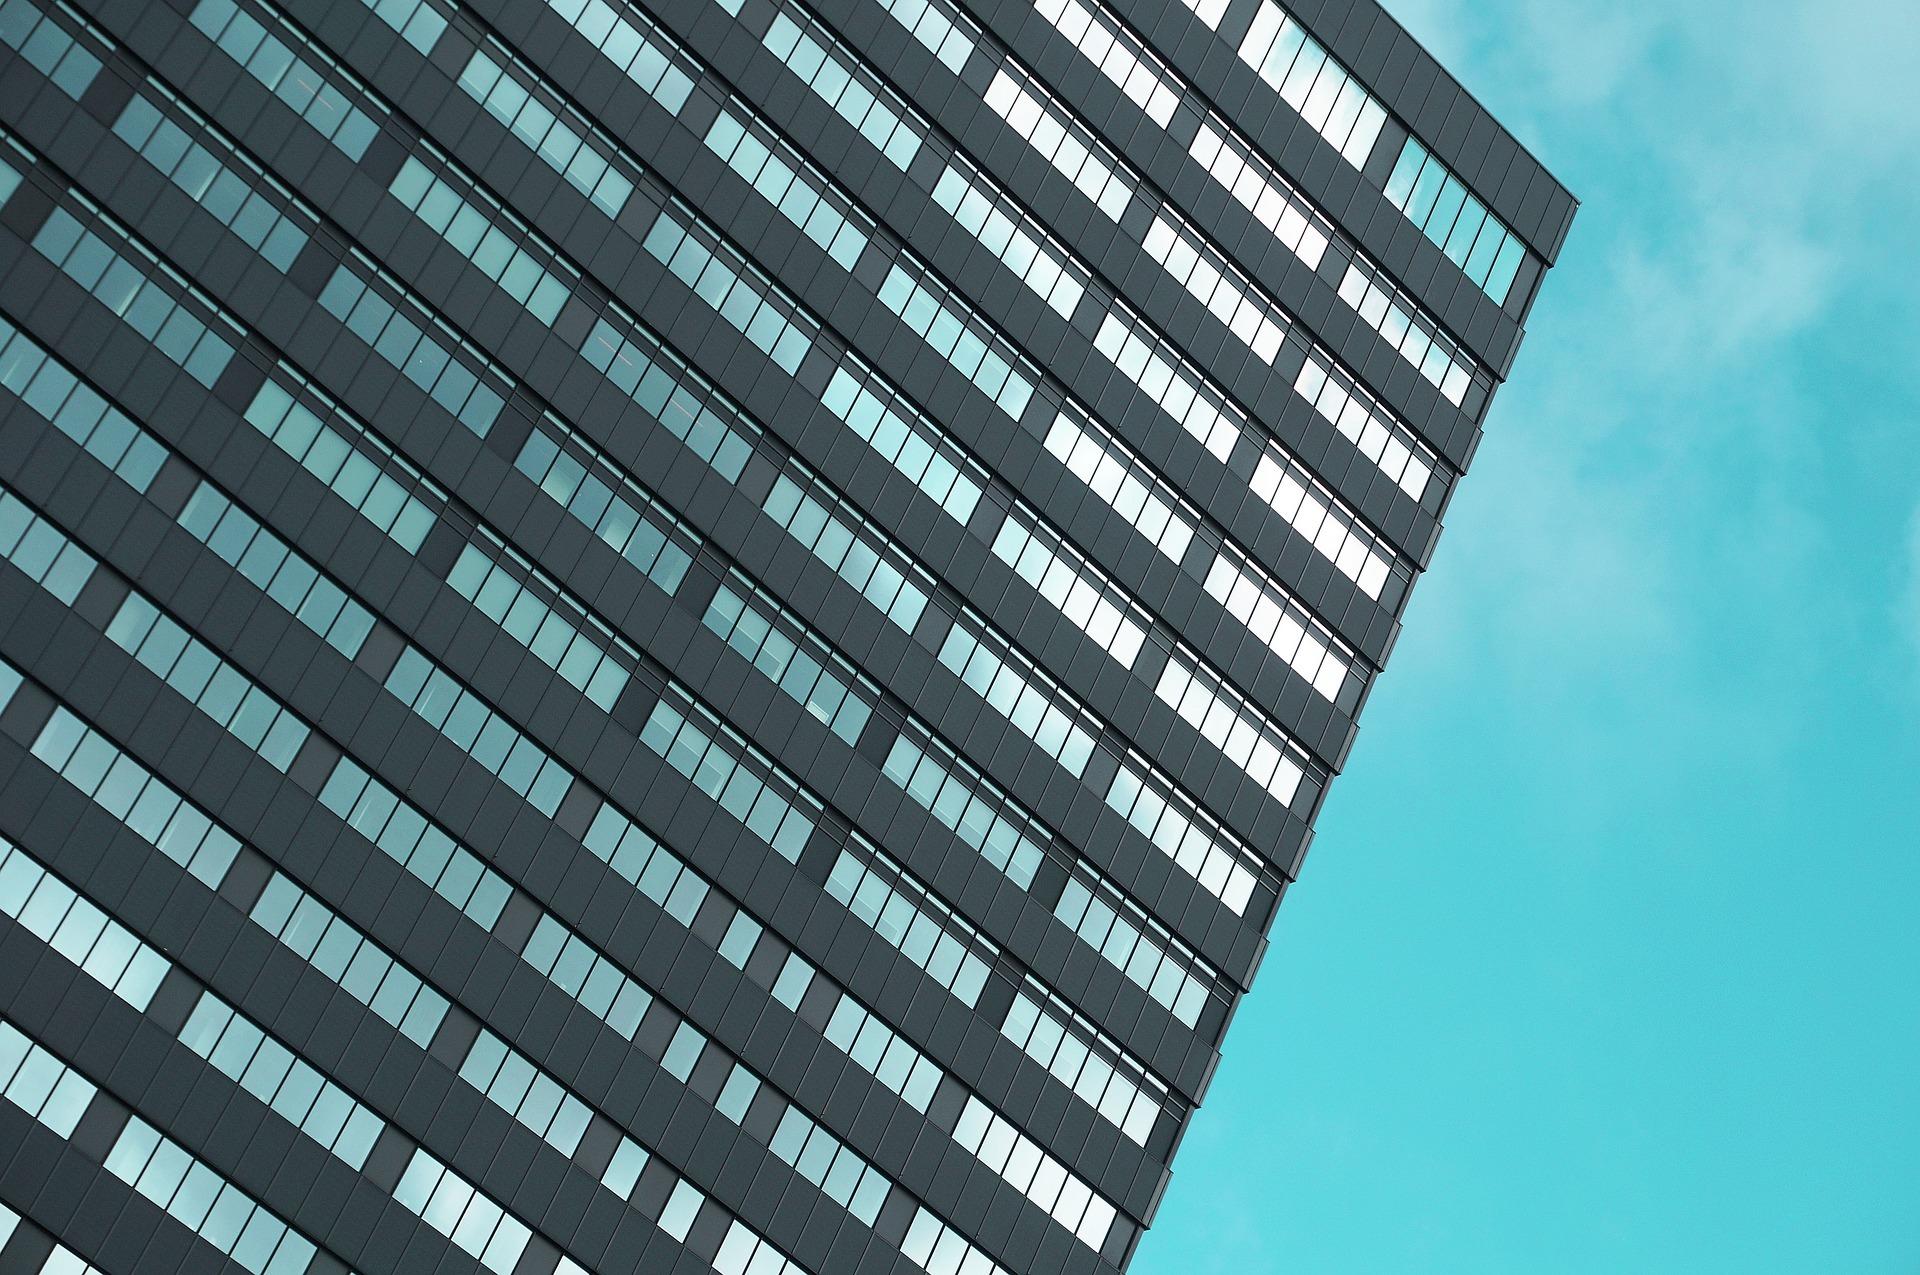 building-2617044_1920.jpg